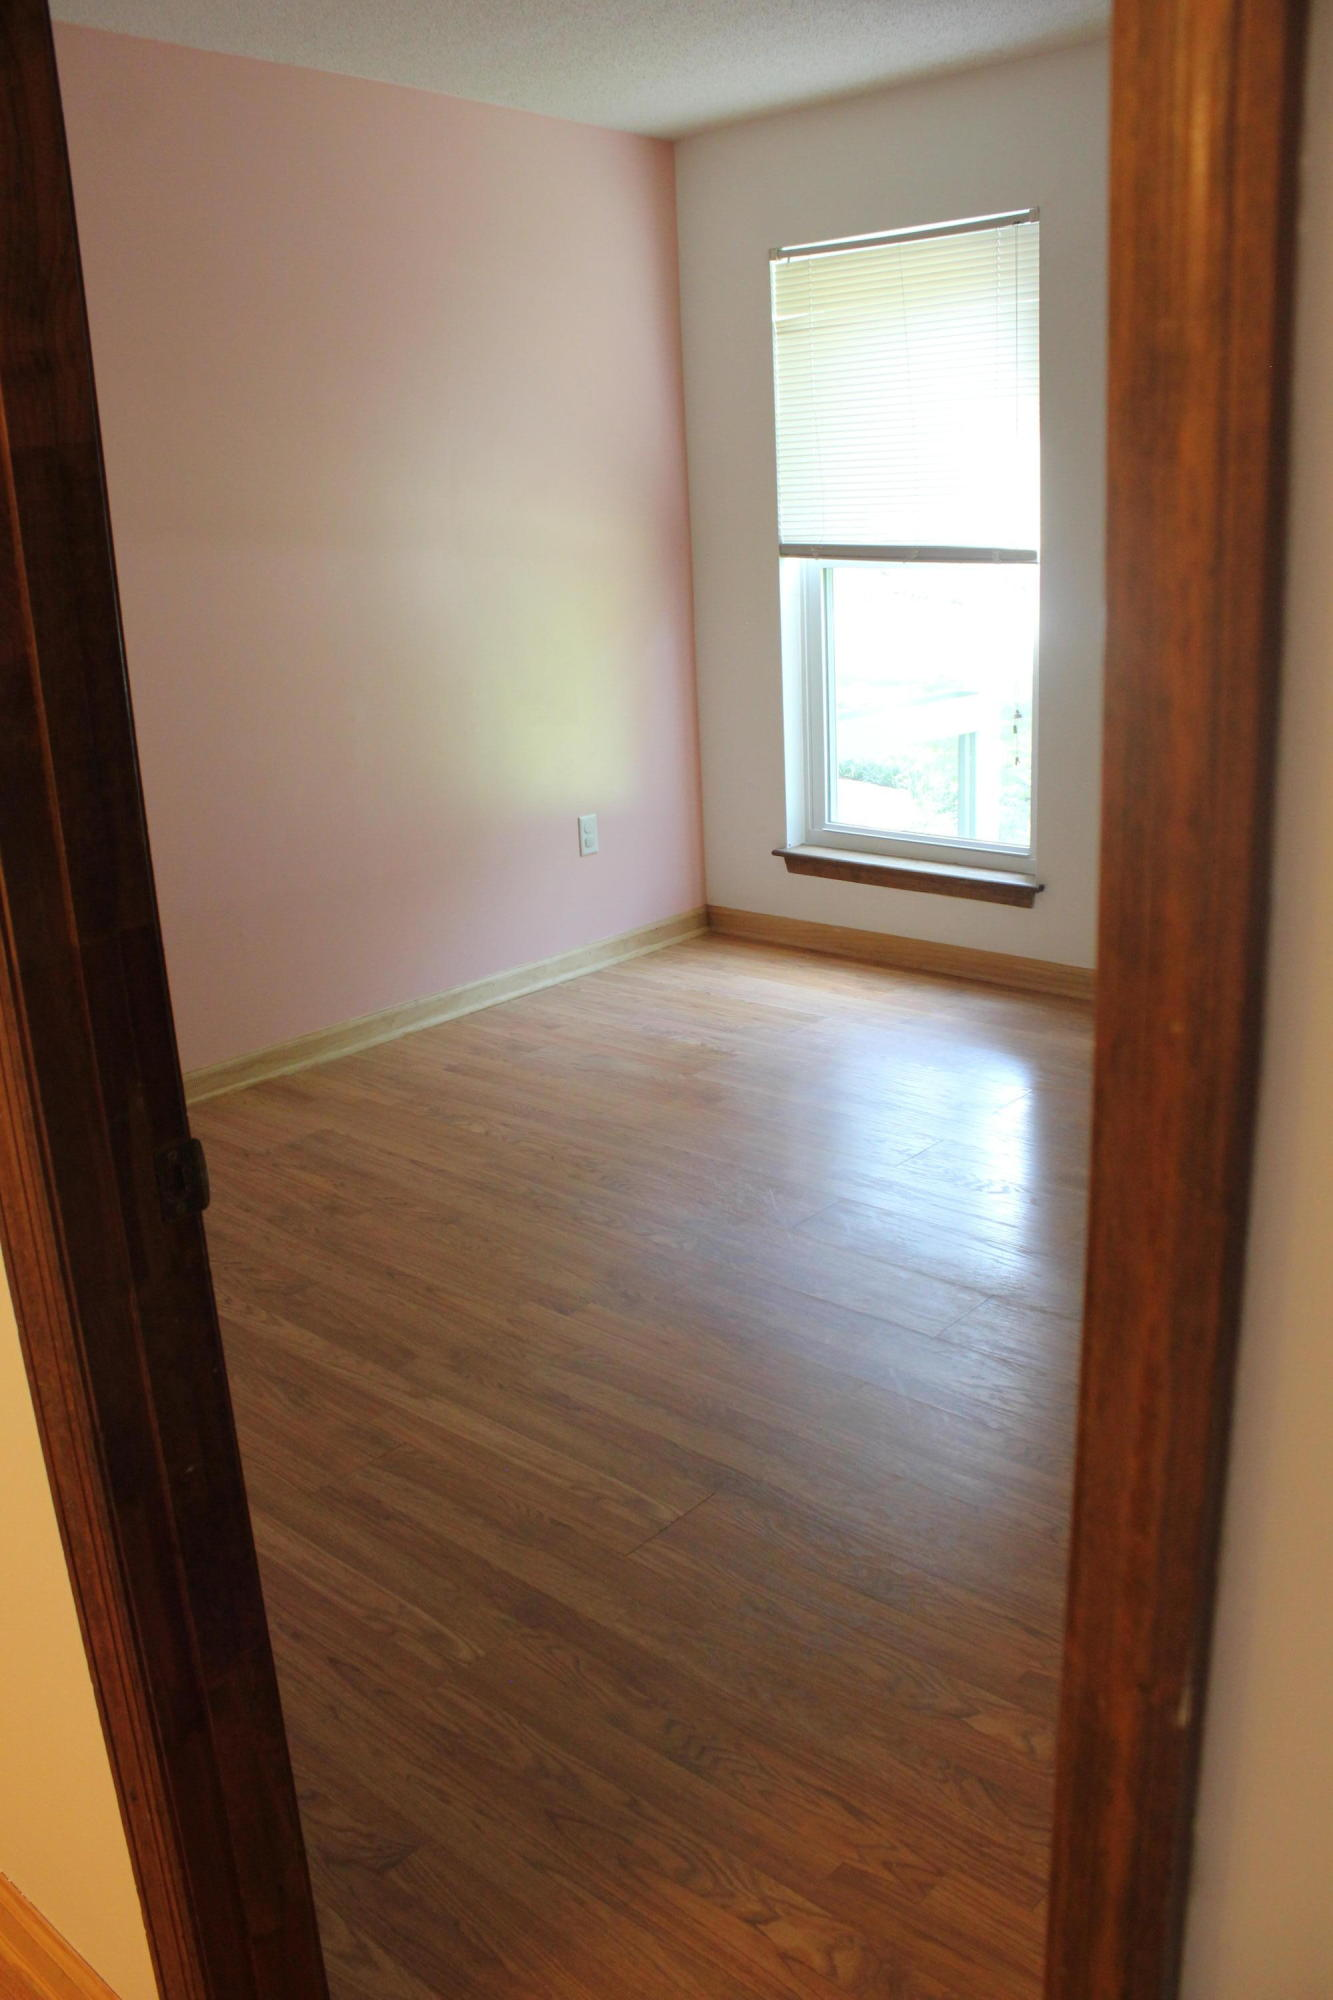 Ashleytowne Landing Homes For Sale - 2726 Jobee, Charleston, SC - 2